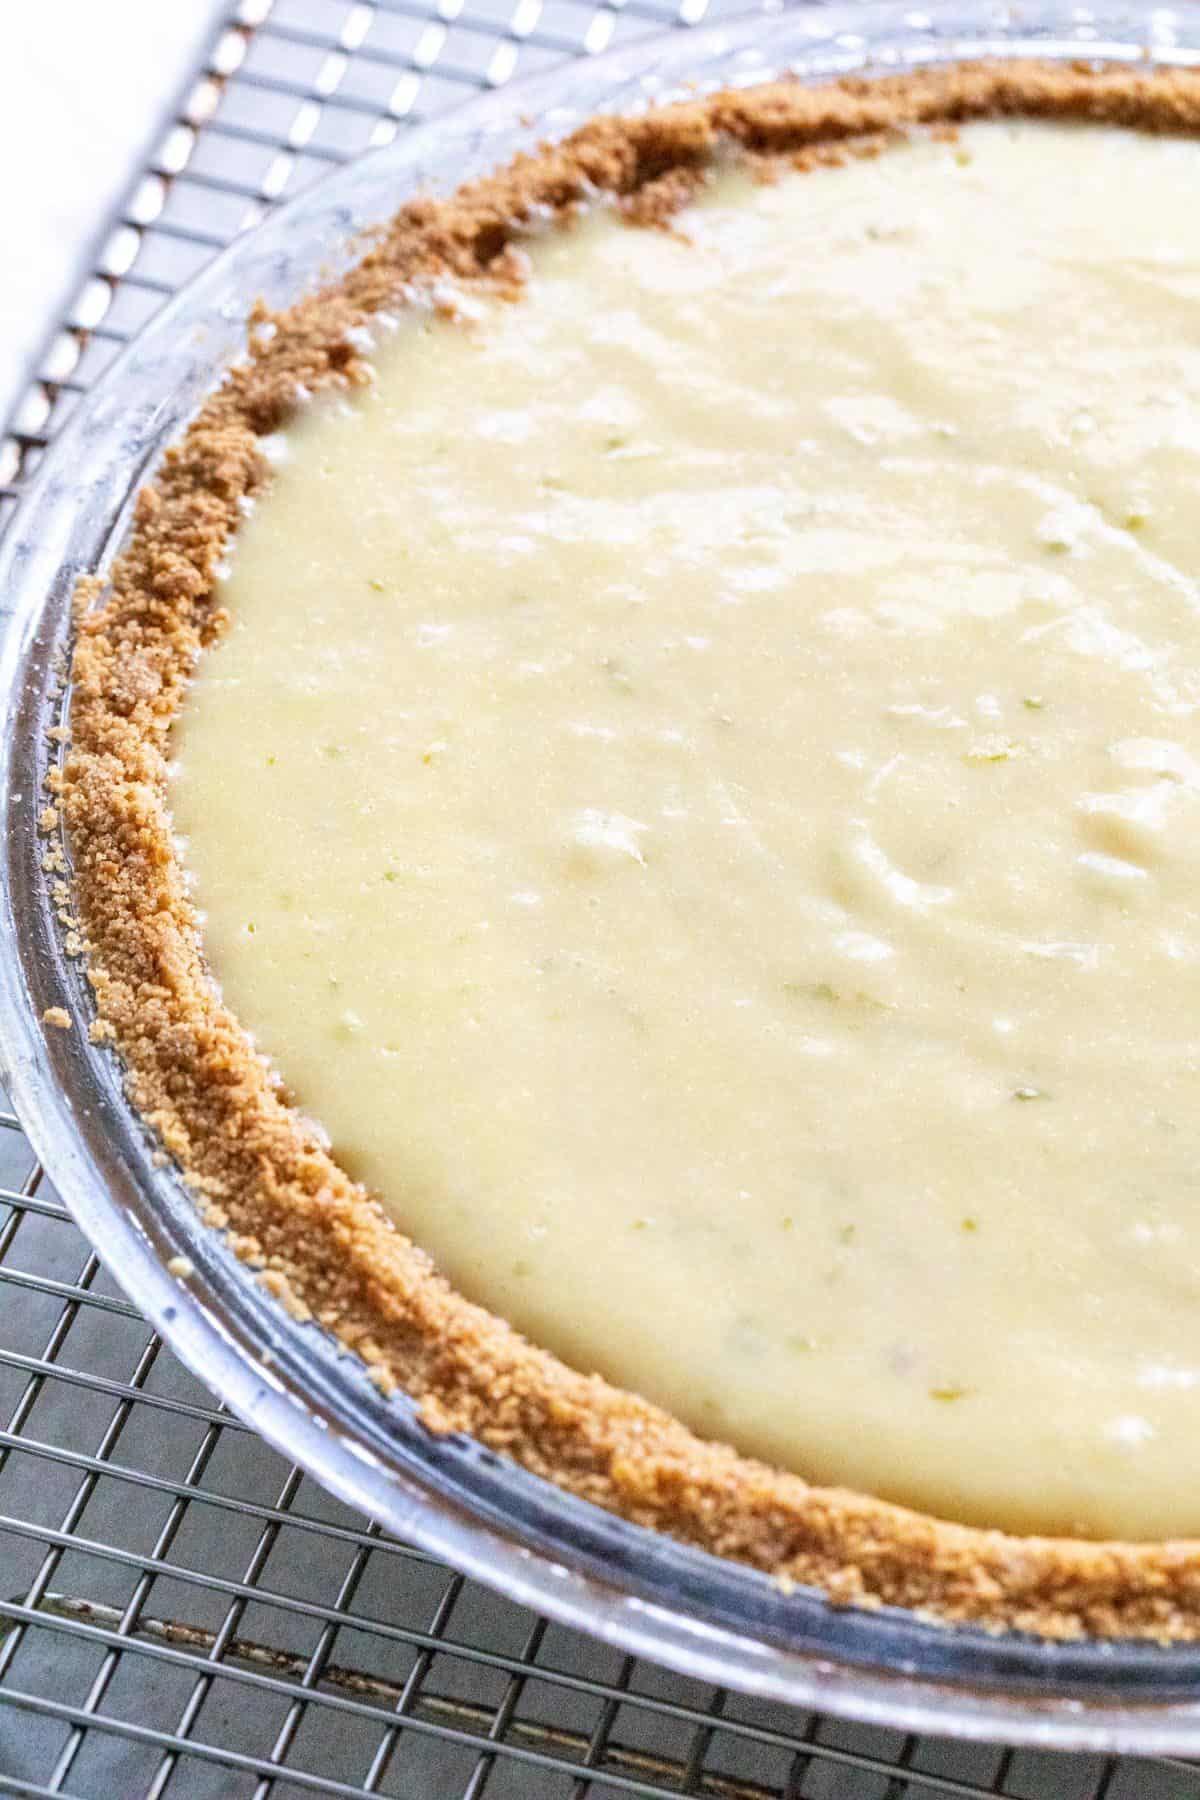 Key lime pie filling